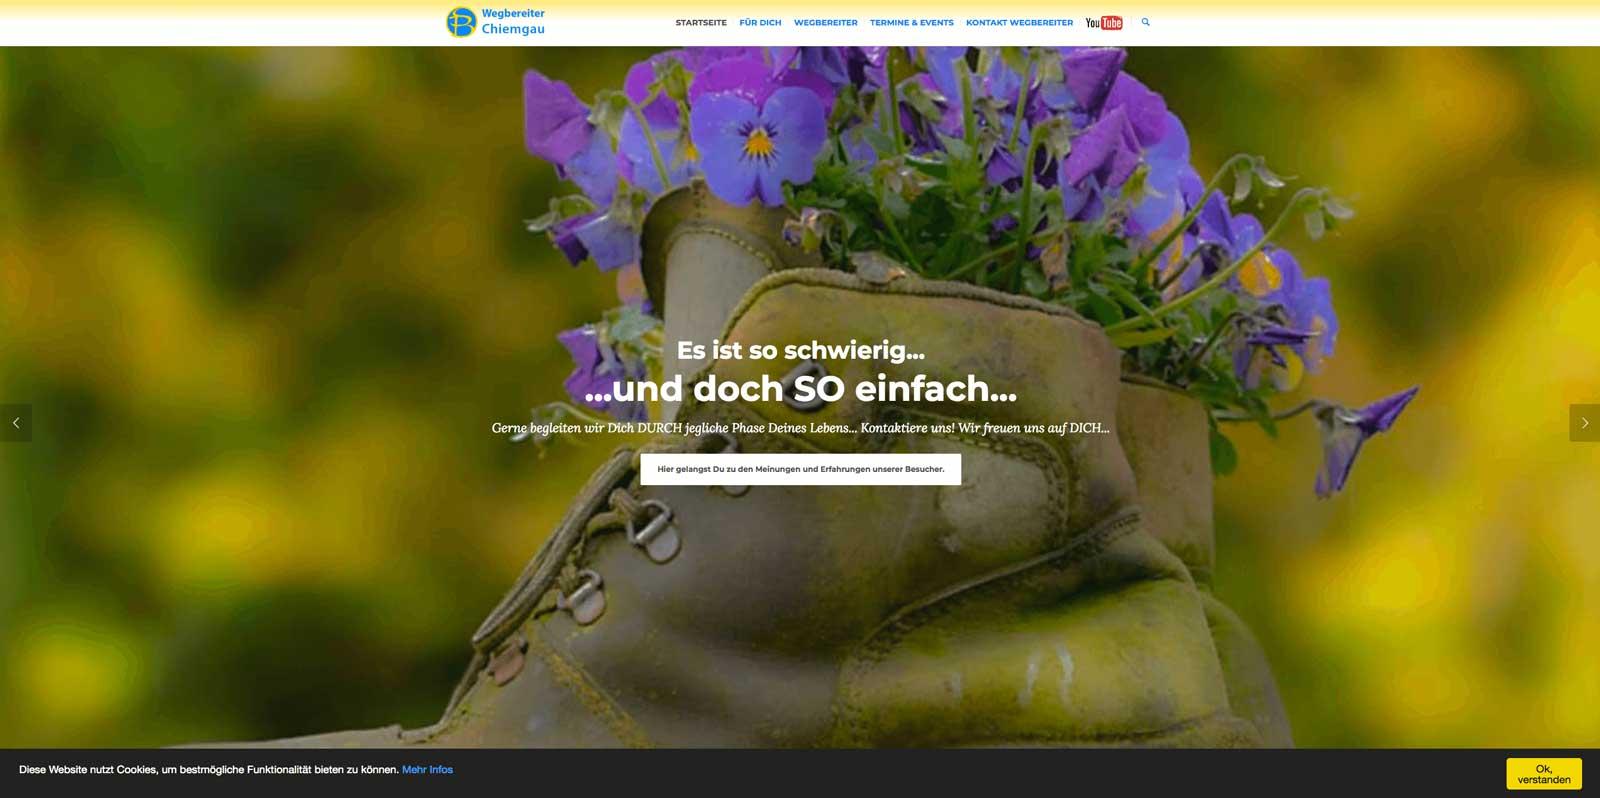 web-xplosion - wegbereiter - webdesign münchen